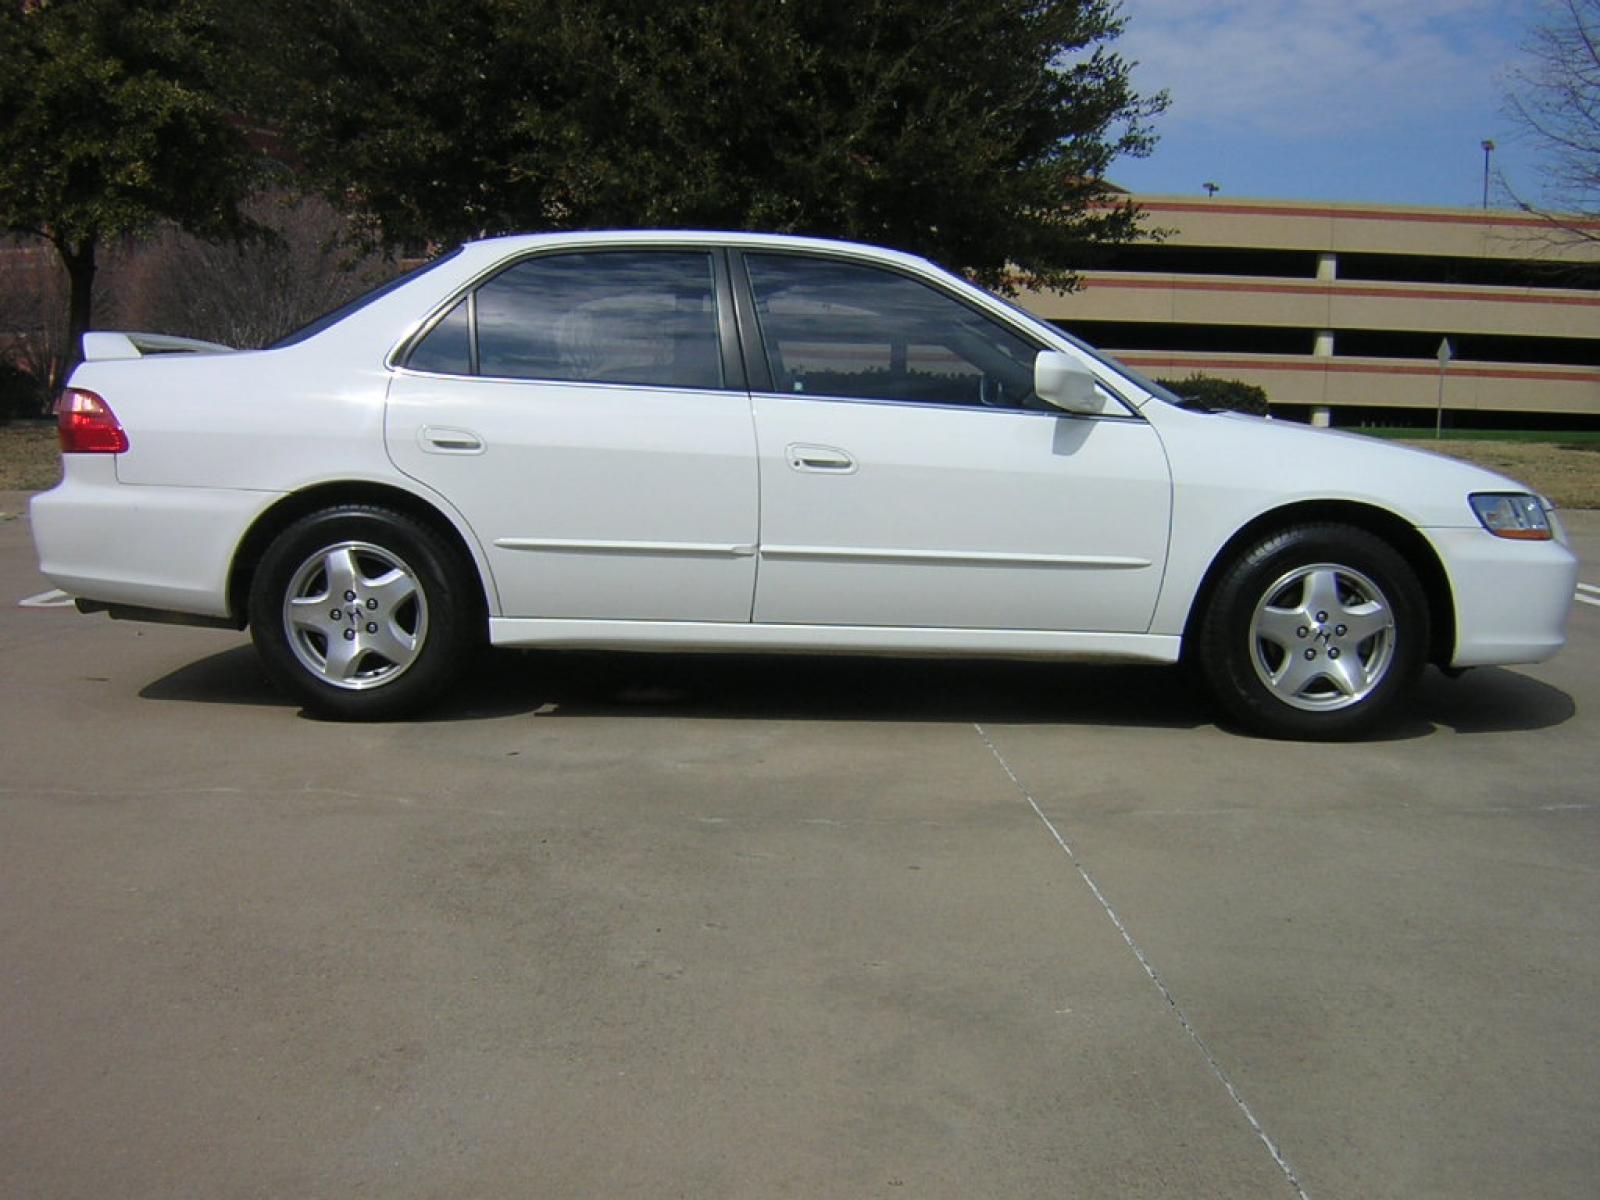 2001 Honda Accord Information and photos ZombieDrive